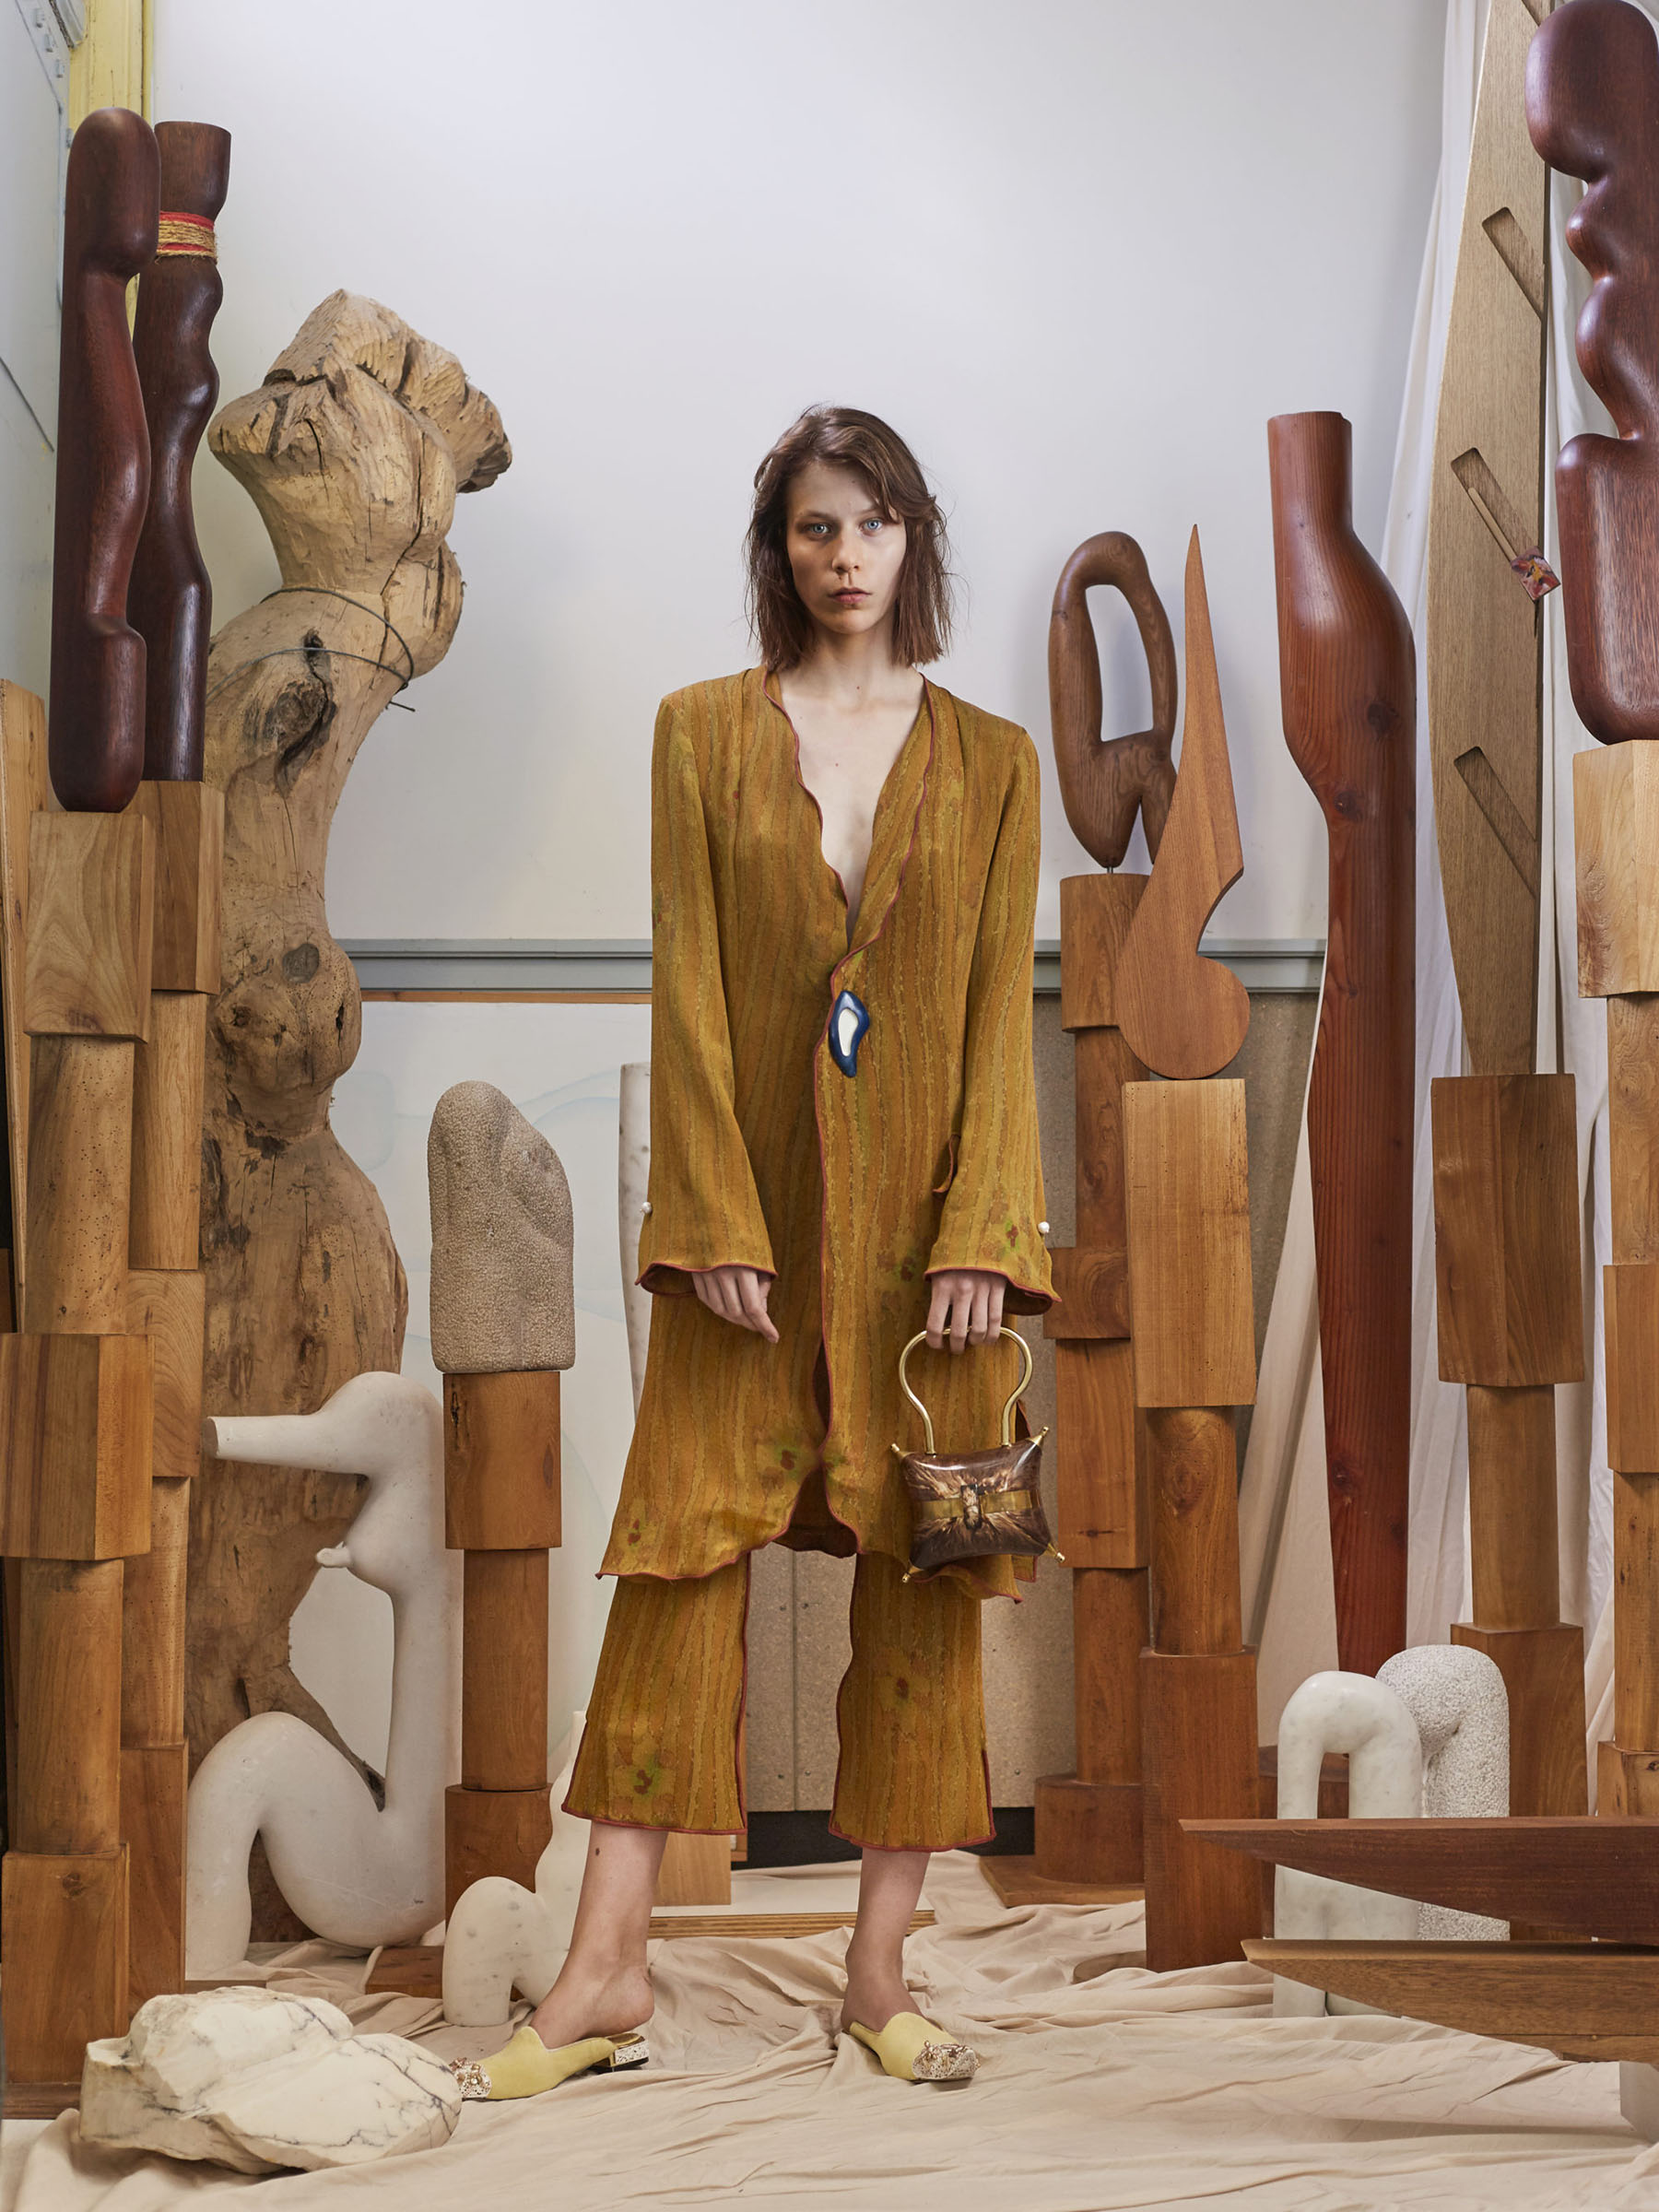 iGNANT-Fashion-Peet-Dullaert-SS18-002